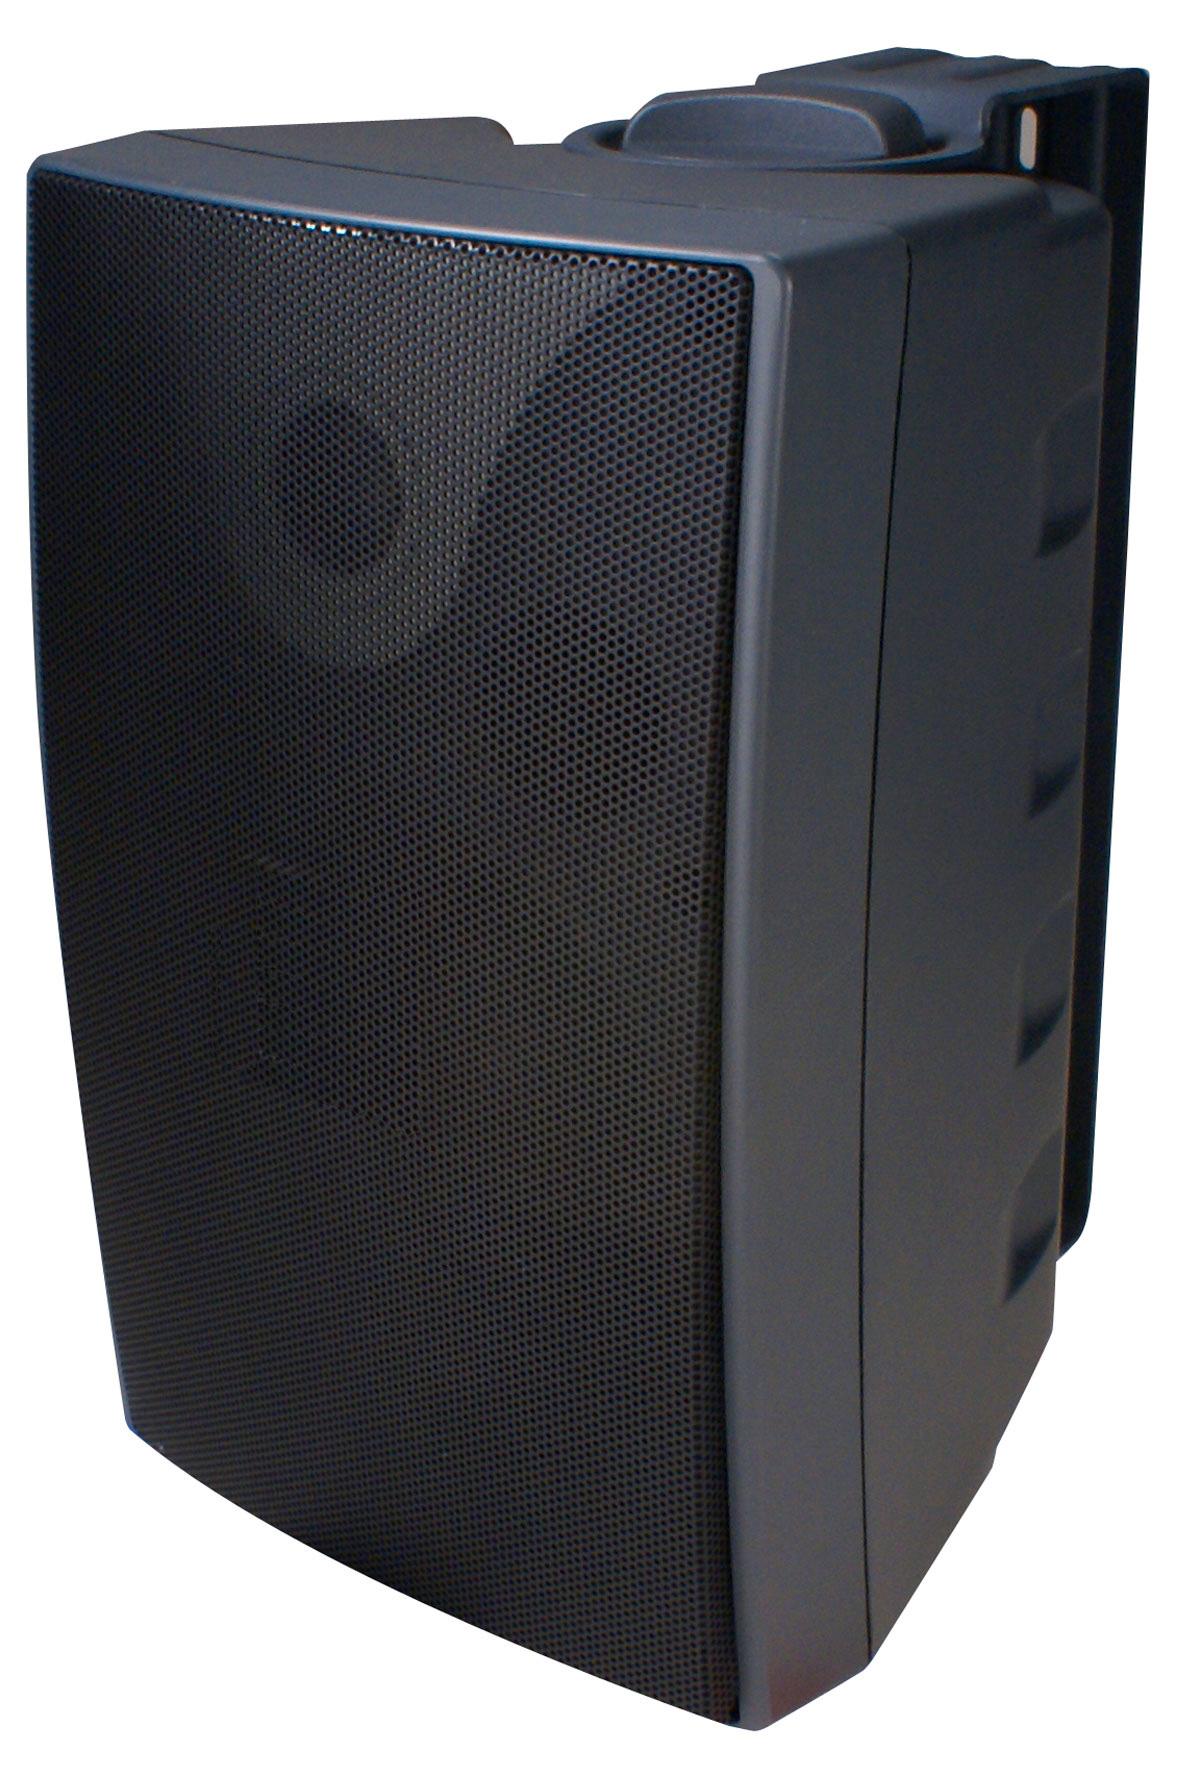 Speco Sp6awx 6 Inch Outdoor Speaker Black Pair